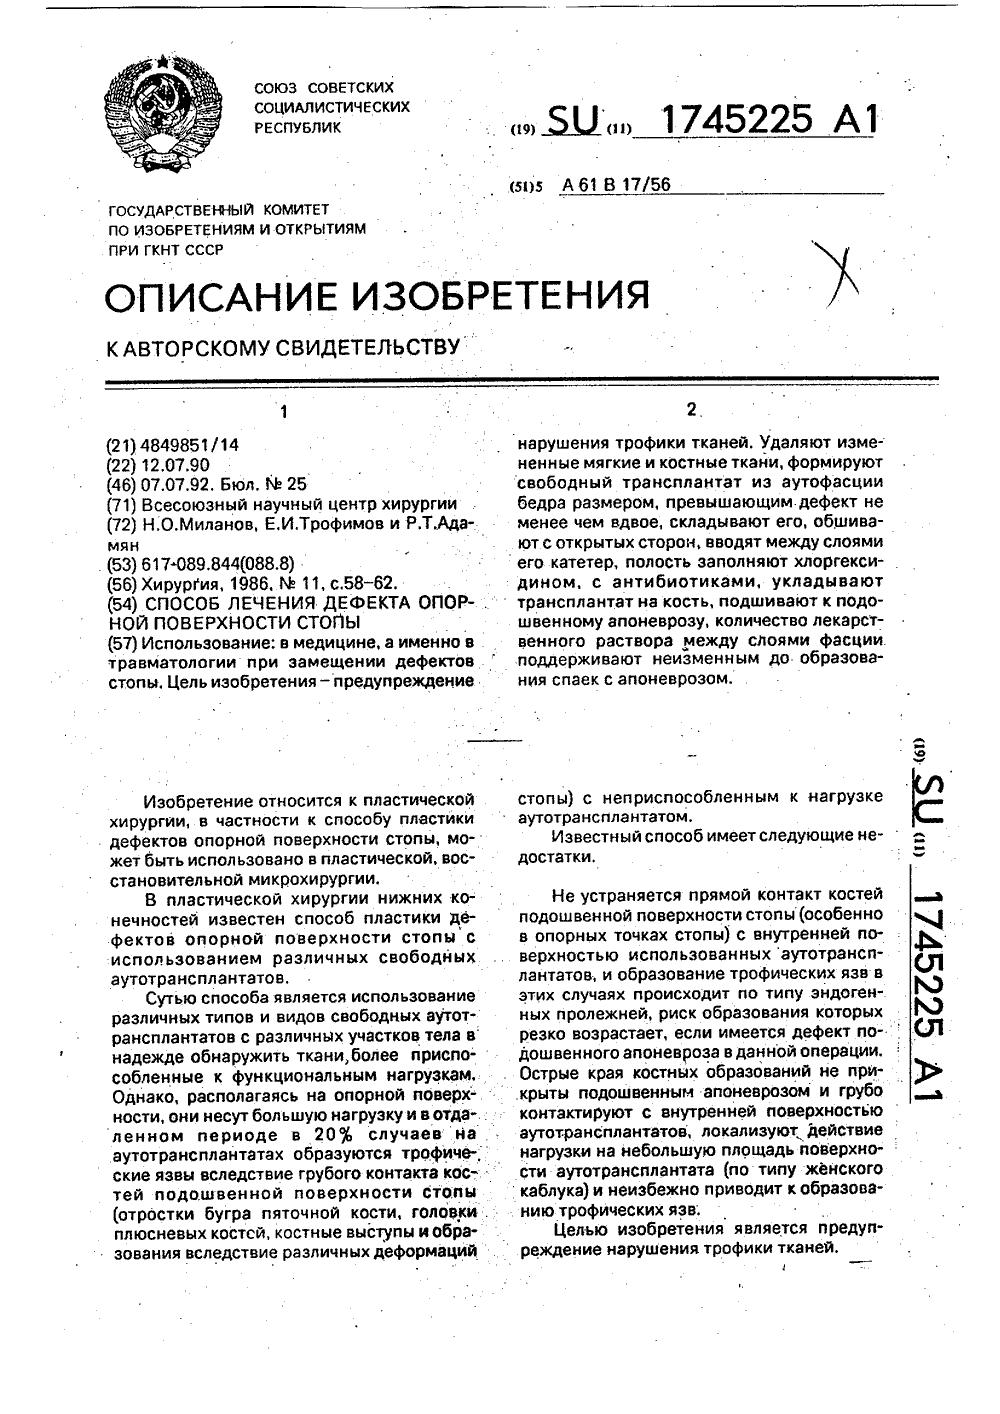 схема лечения лимфостаза